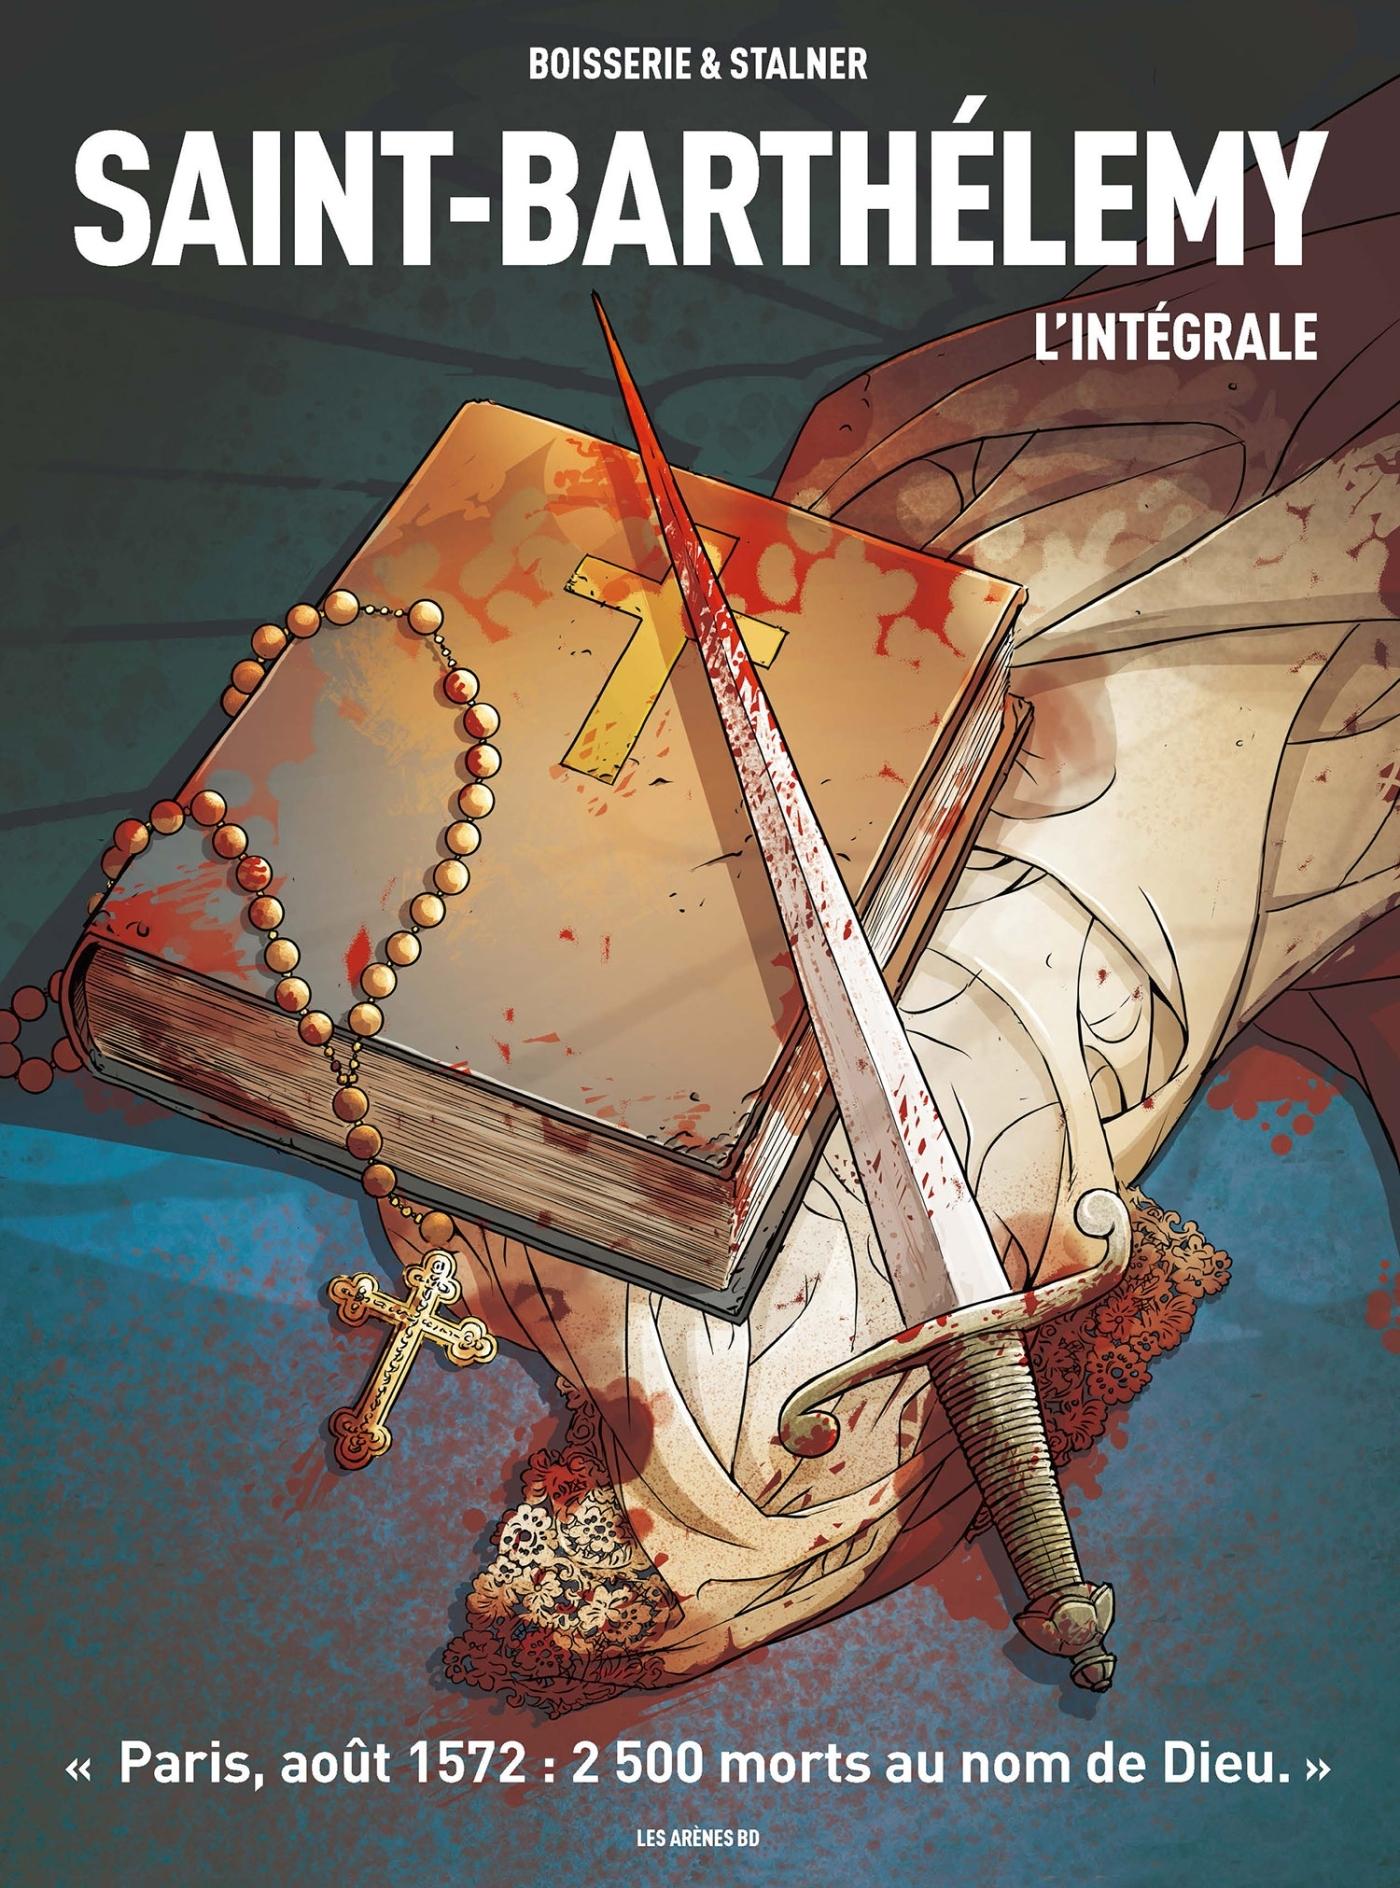 SAINT-BARTHELEMY - L'INTEGRALE